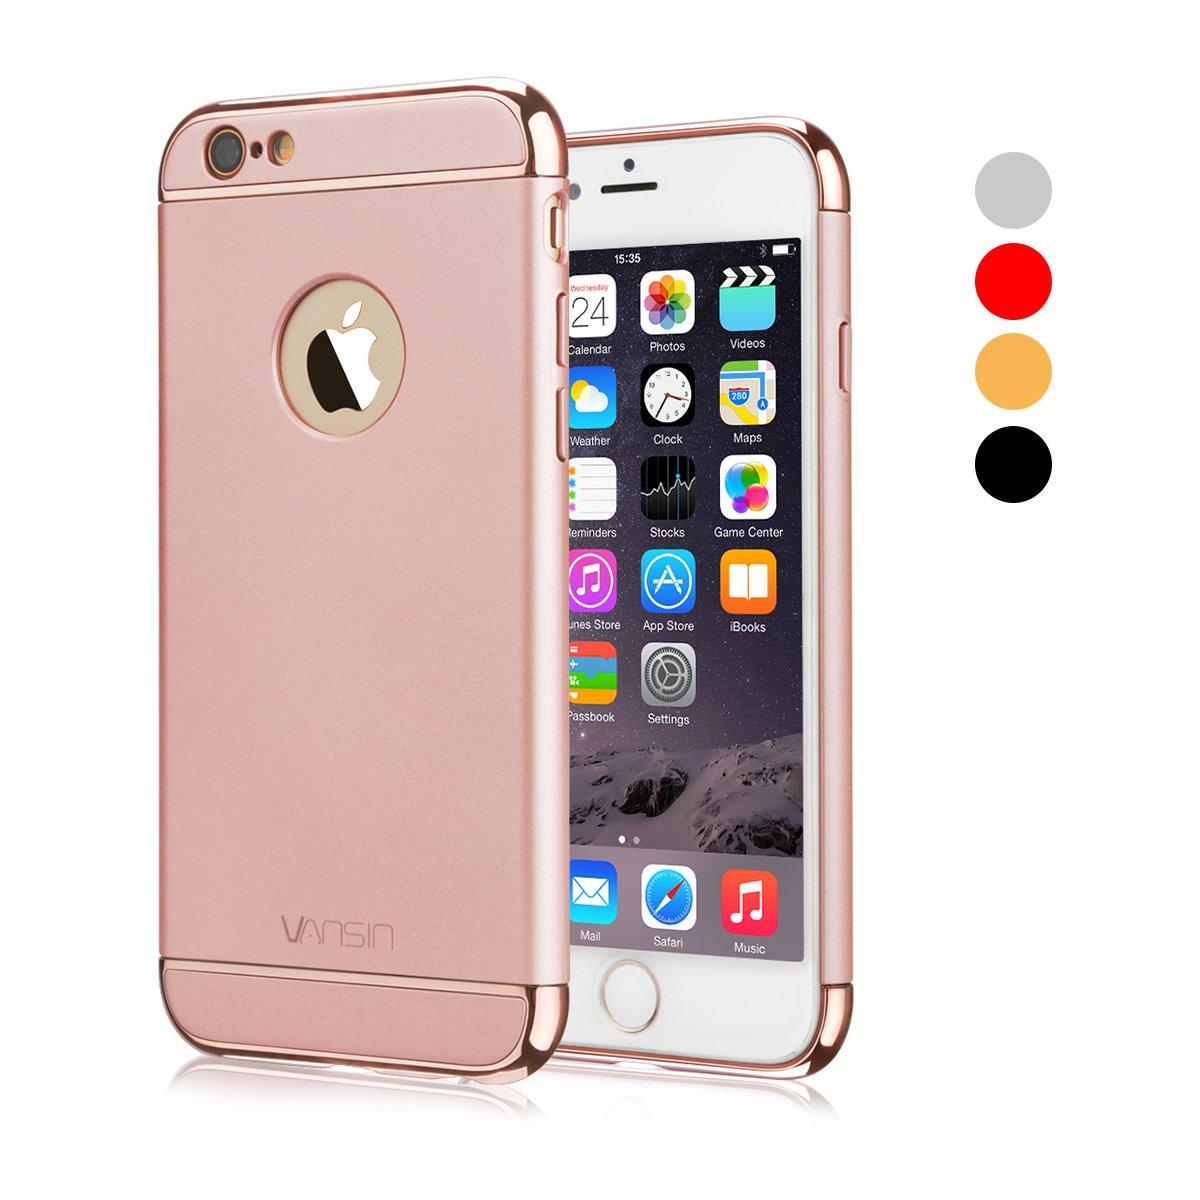 Amazon.com: iPhone 6 Plus Case, VANSIN 3 in 1 Ultra Thin and Slim ...